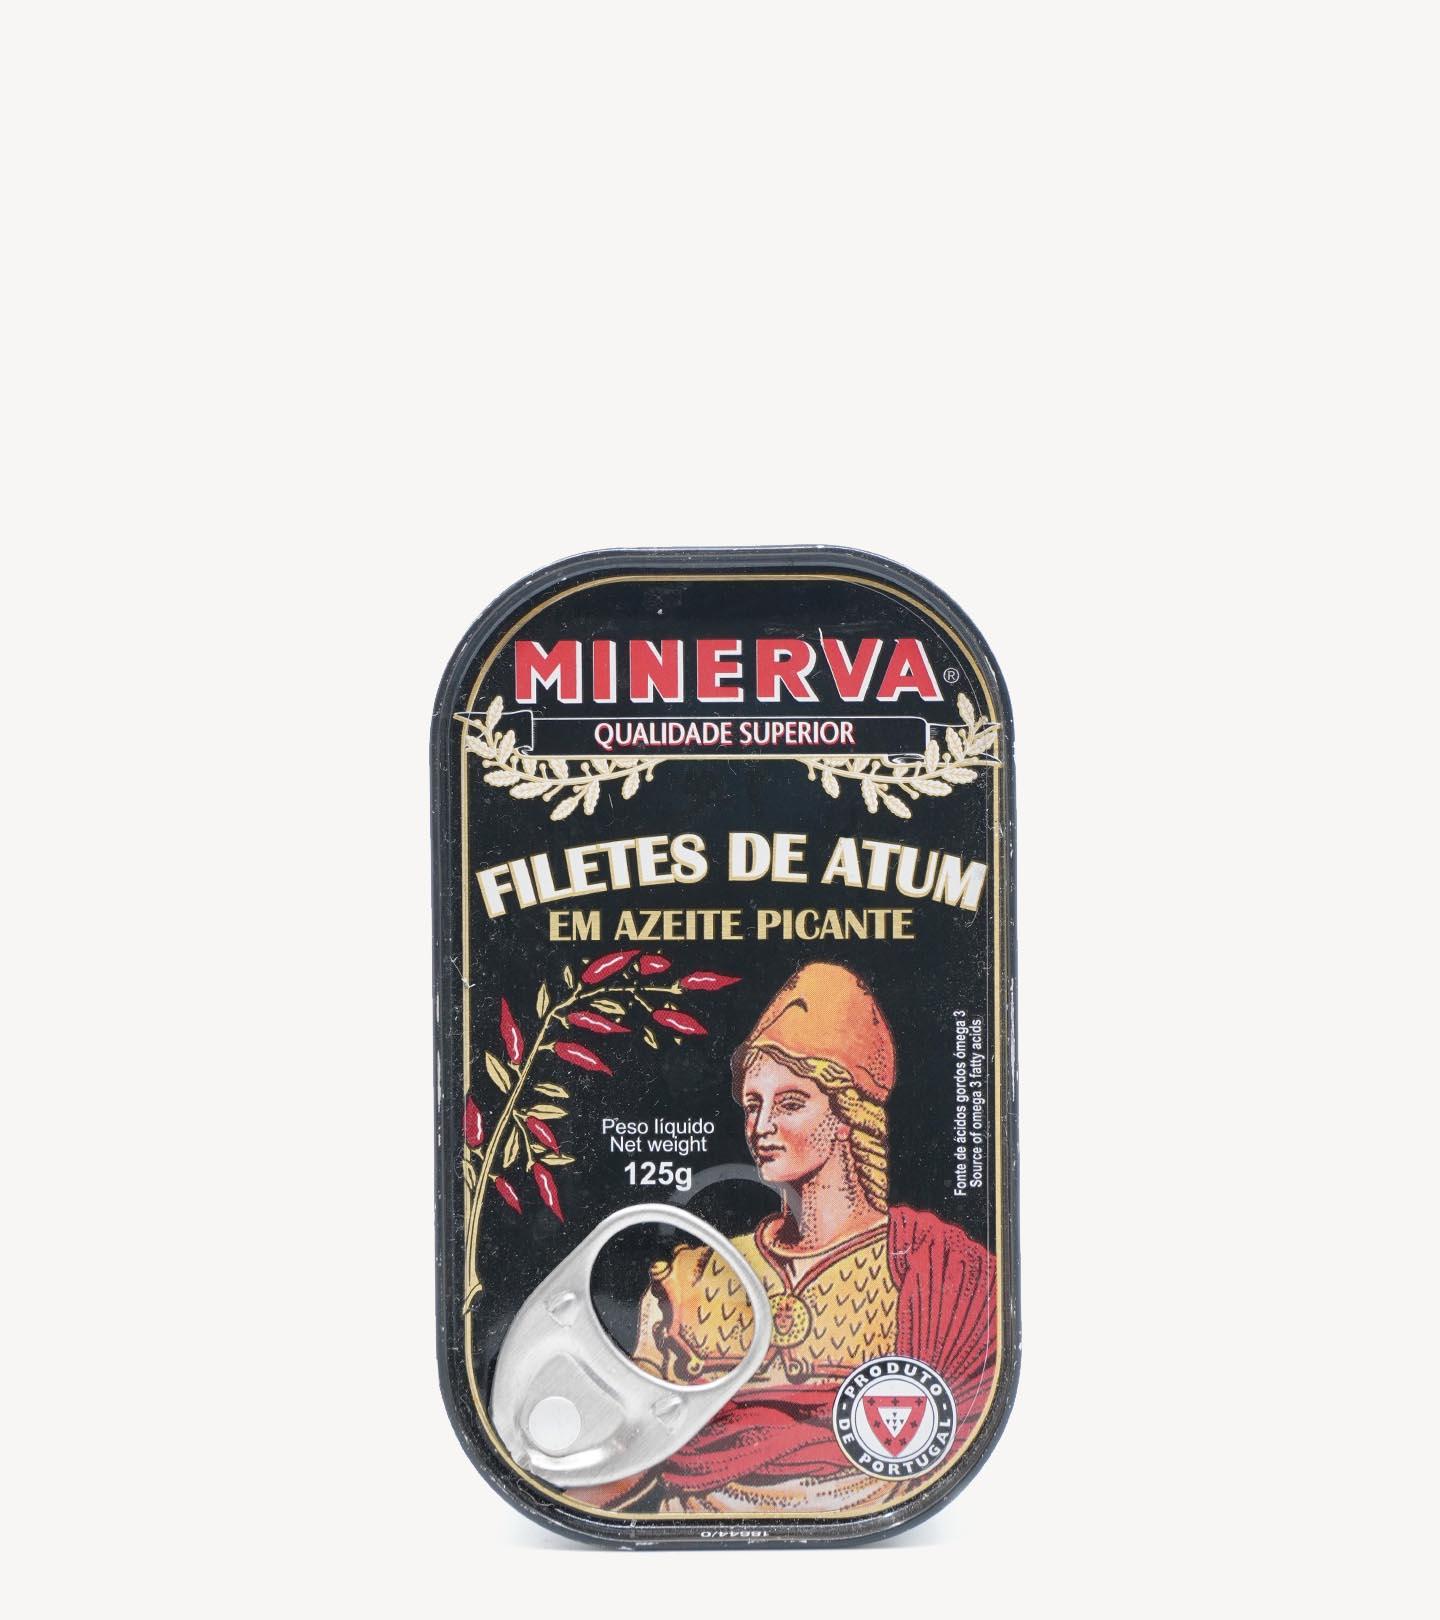 Filetes de Atum em Azeite Picante Minerva 125g